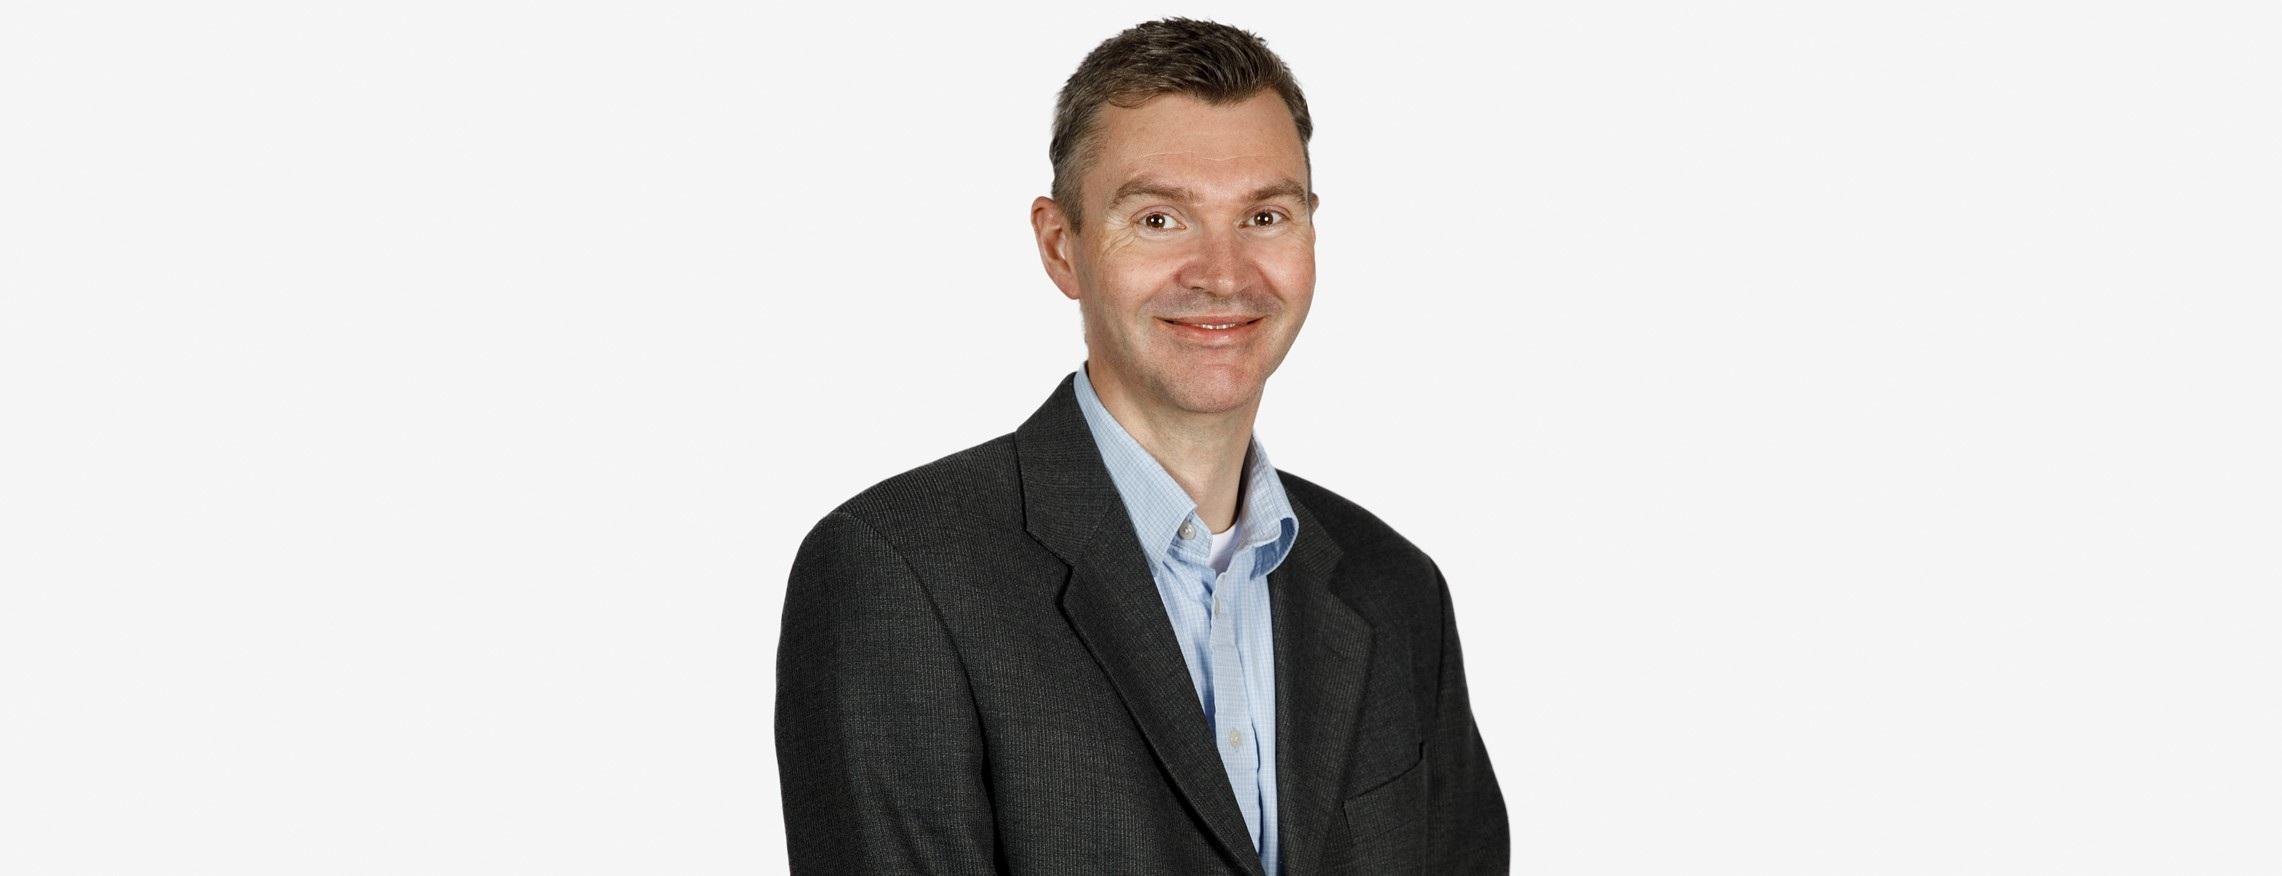 Henrik Øhrn